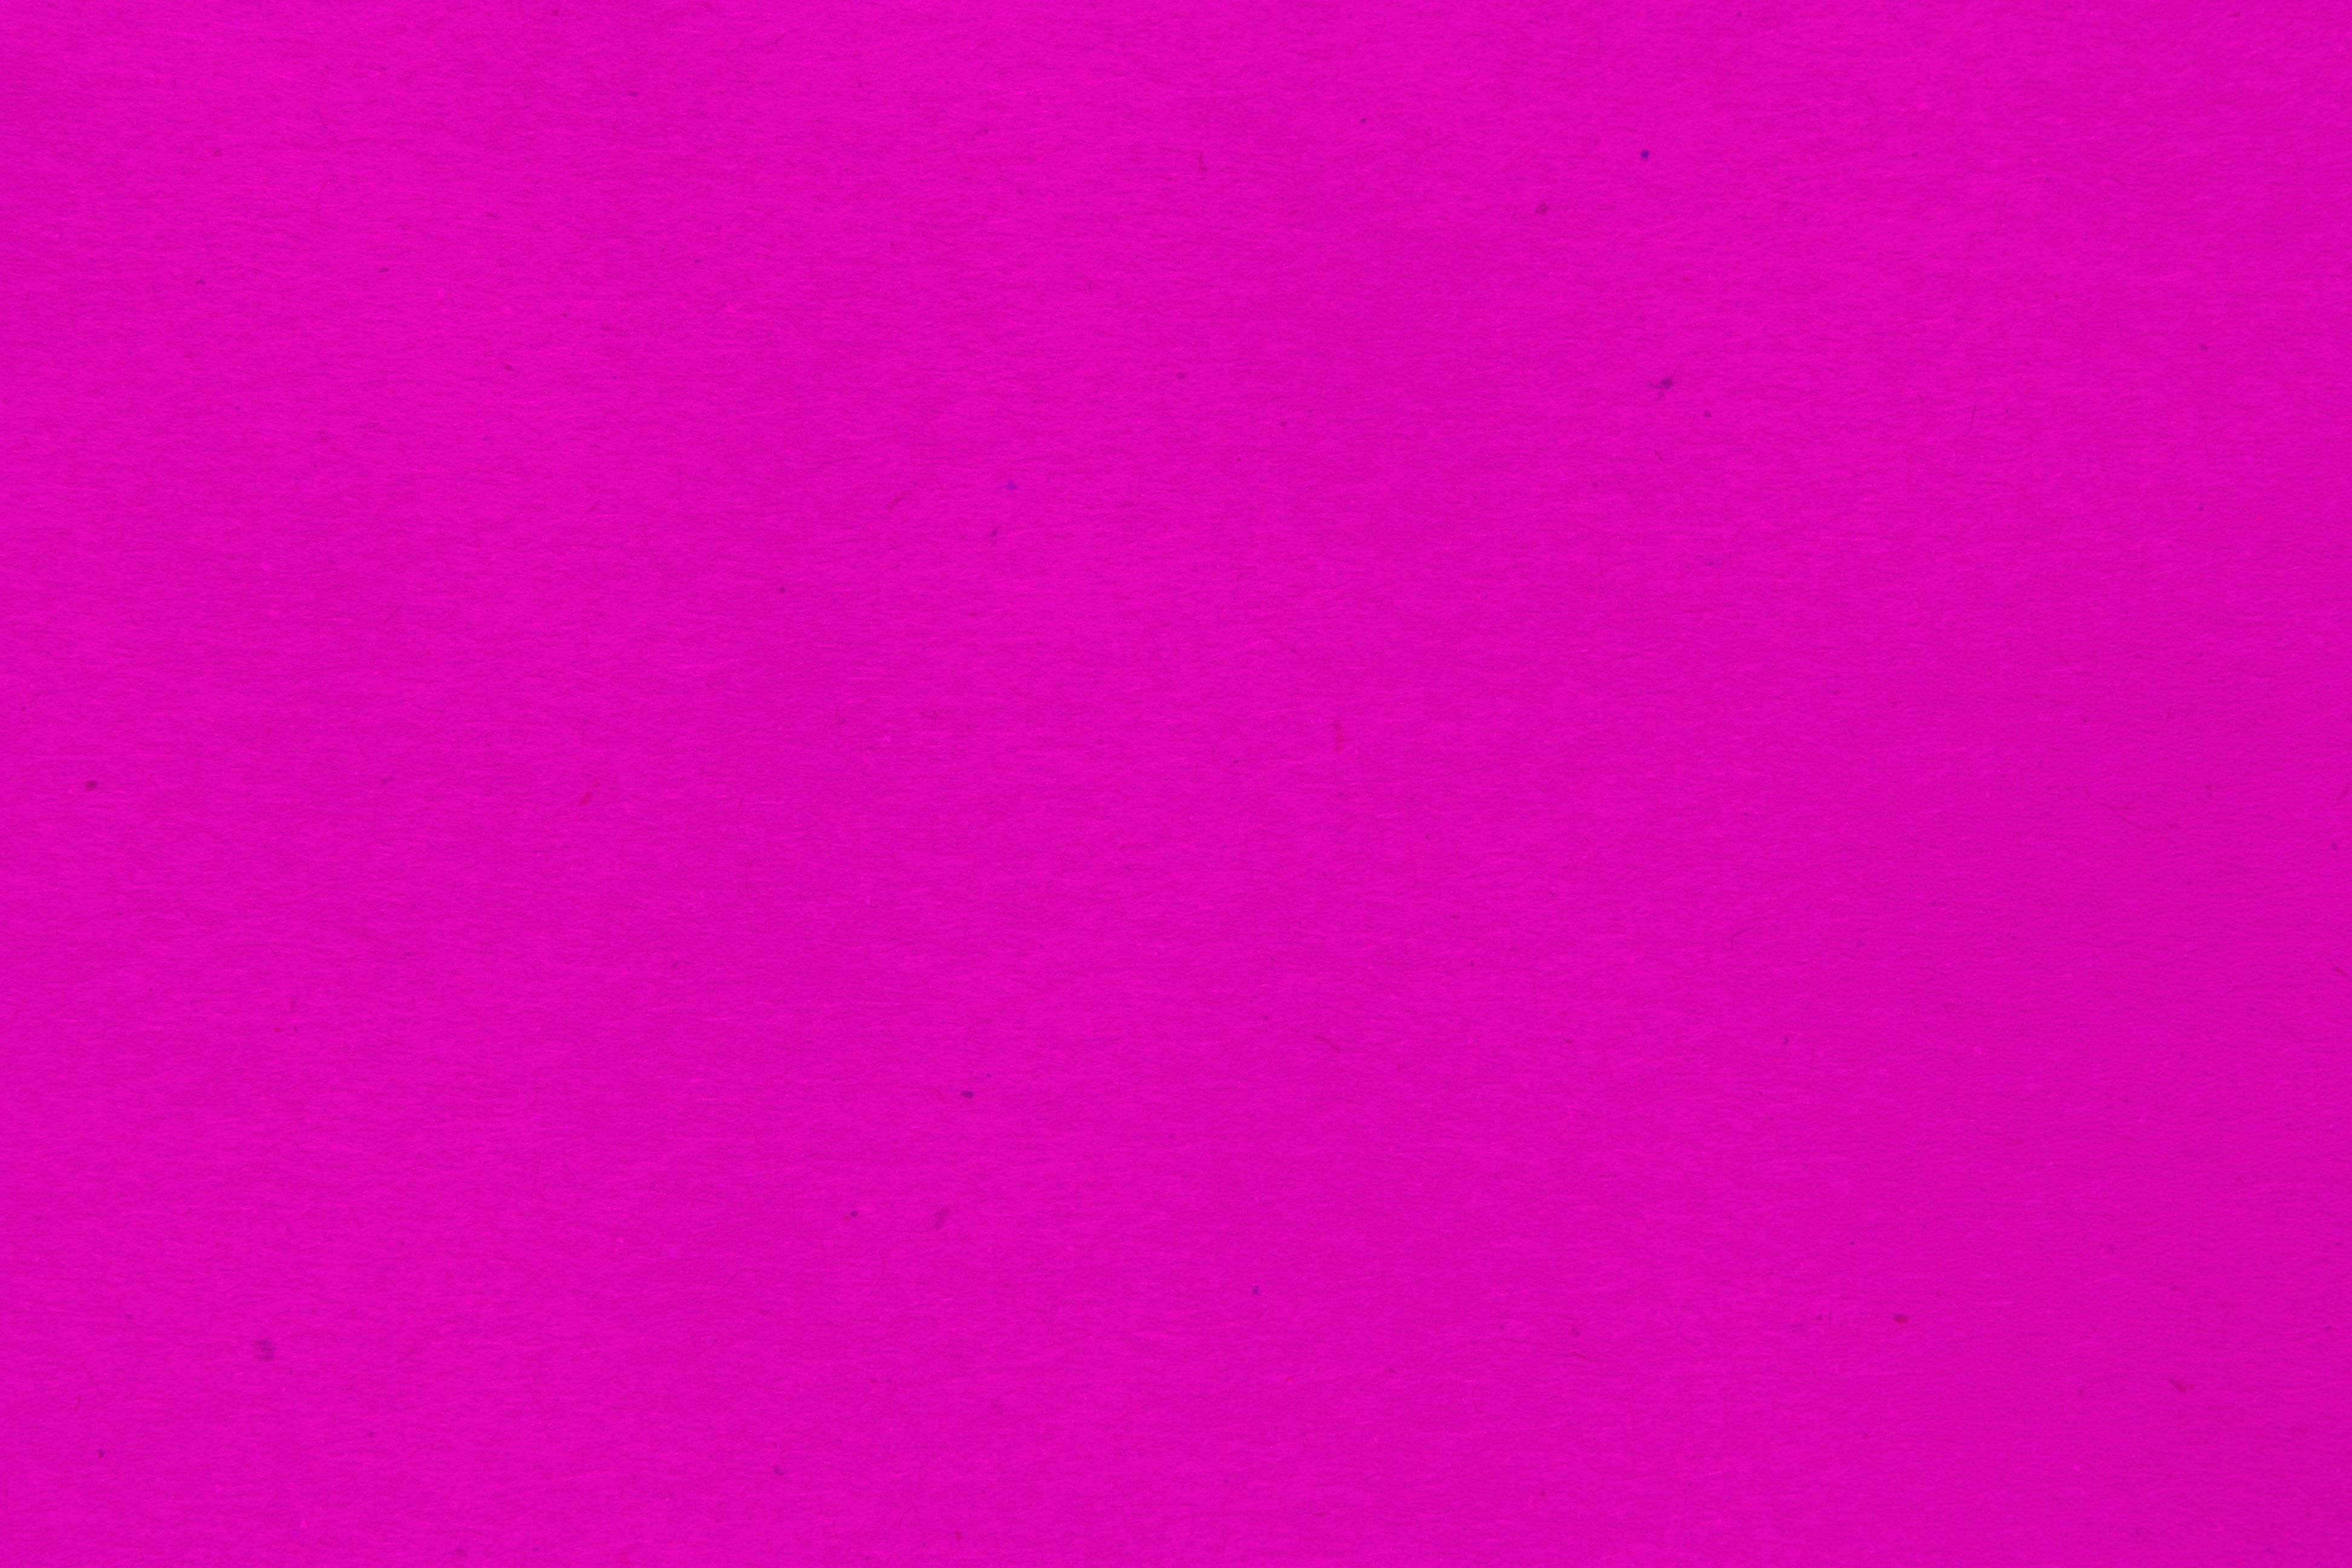 Bright Pink Background - WallpaperSafari